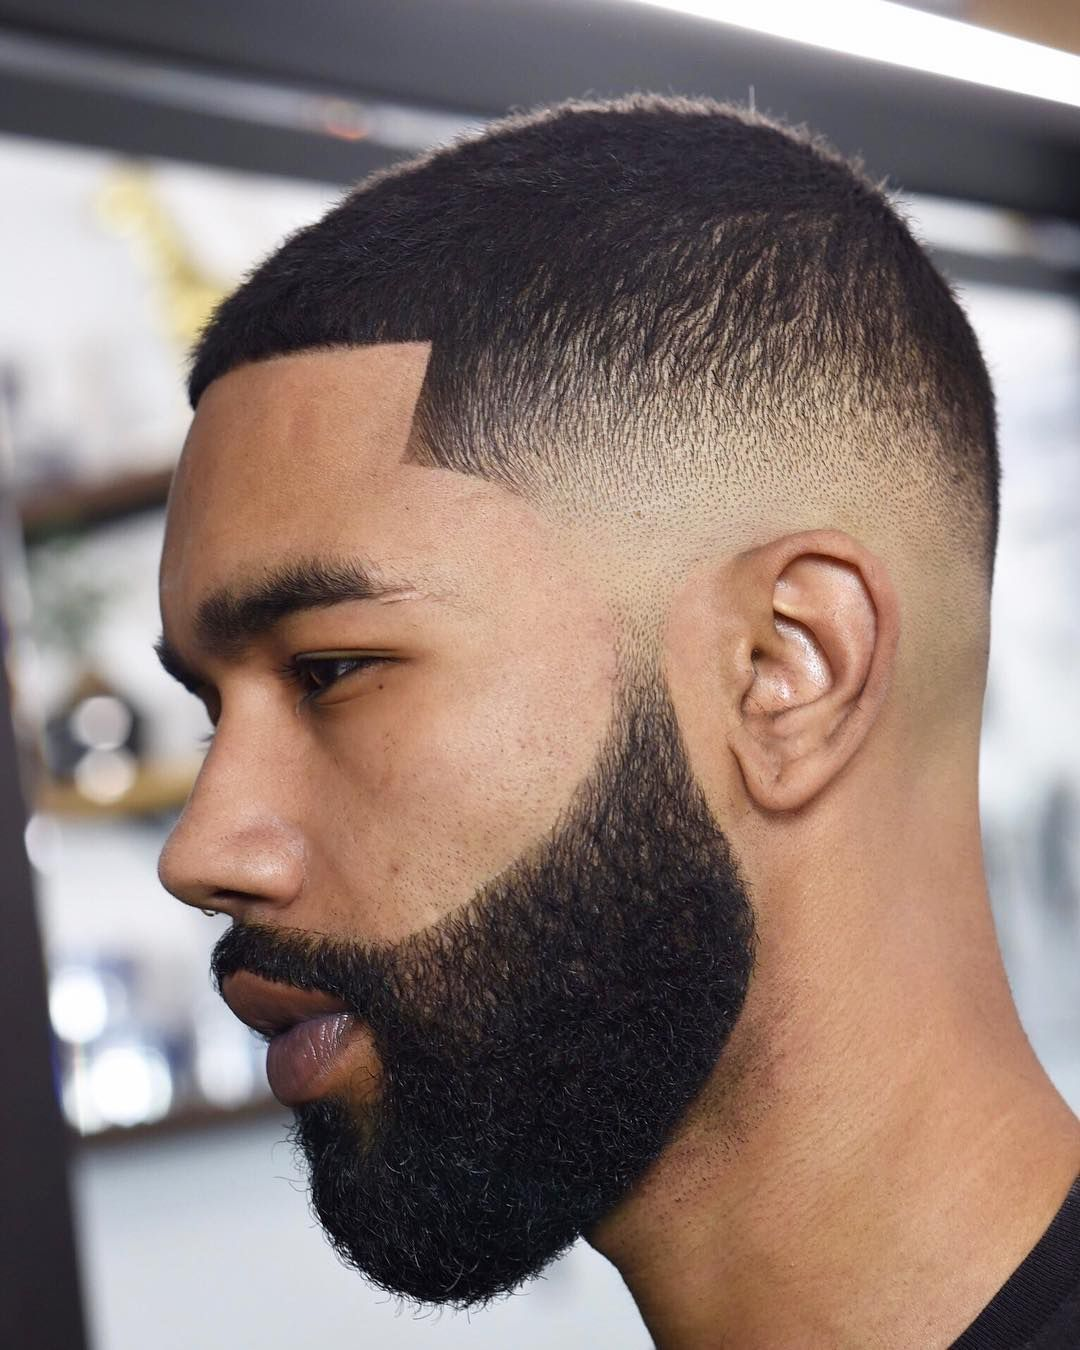 99outfit Com Fashion Style Men Women Mens Haircuts Fade Medium Fade Haircut Beard Haircut